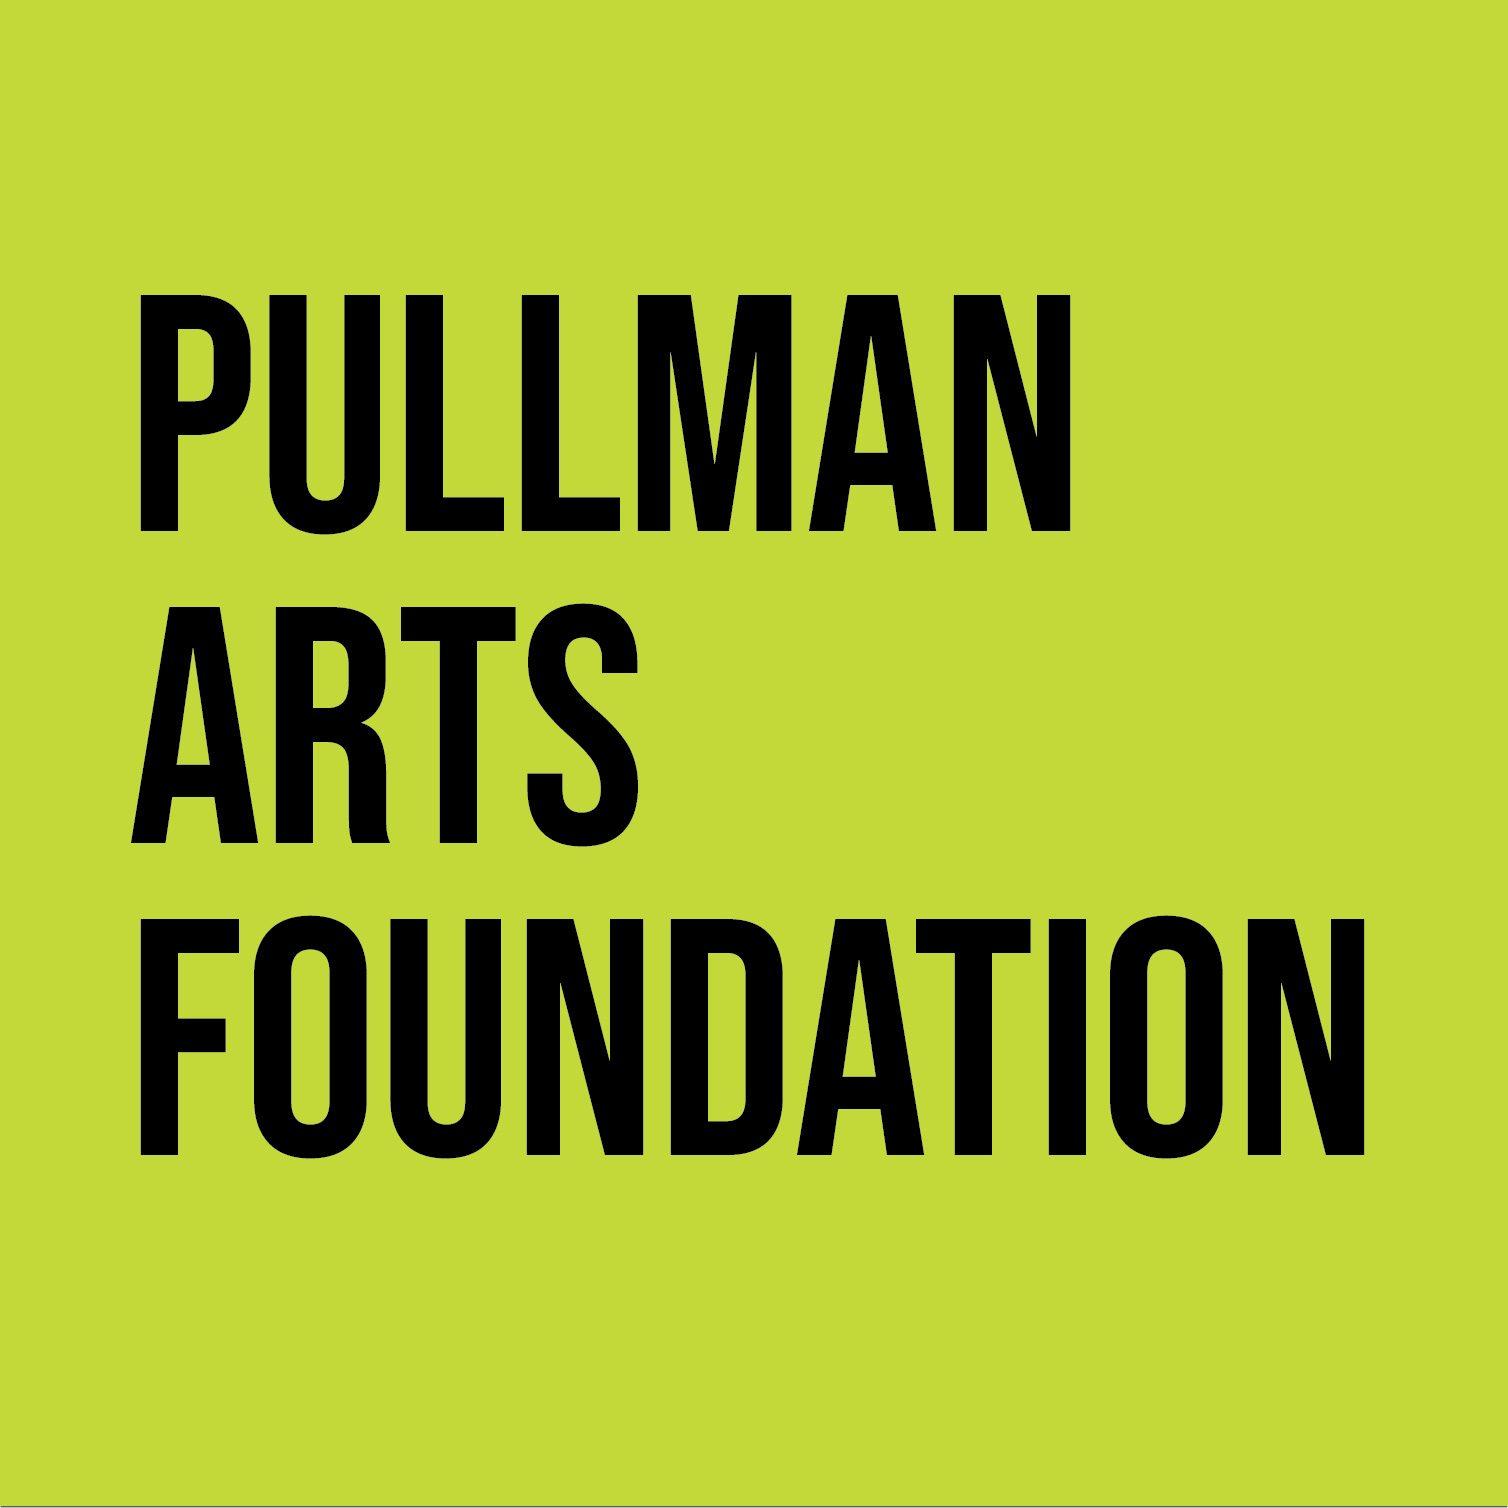 Pullman Arts Foundation